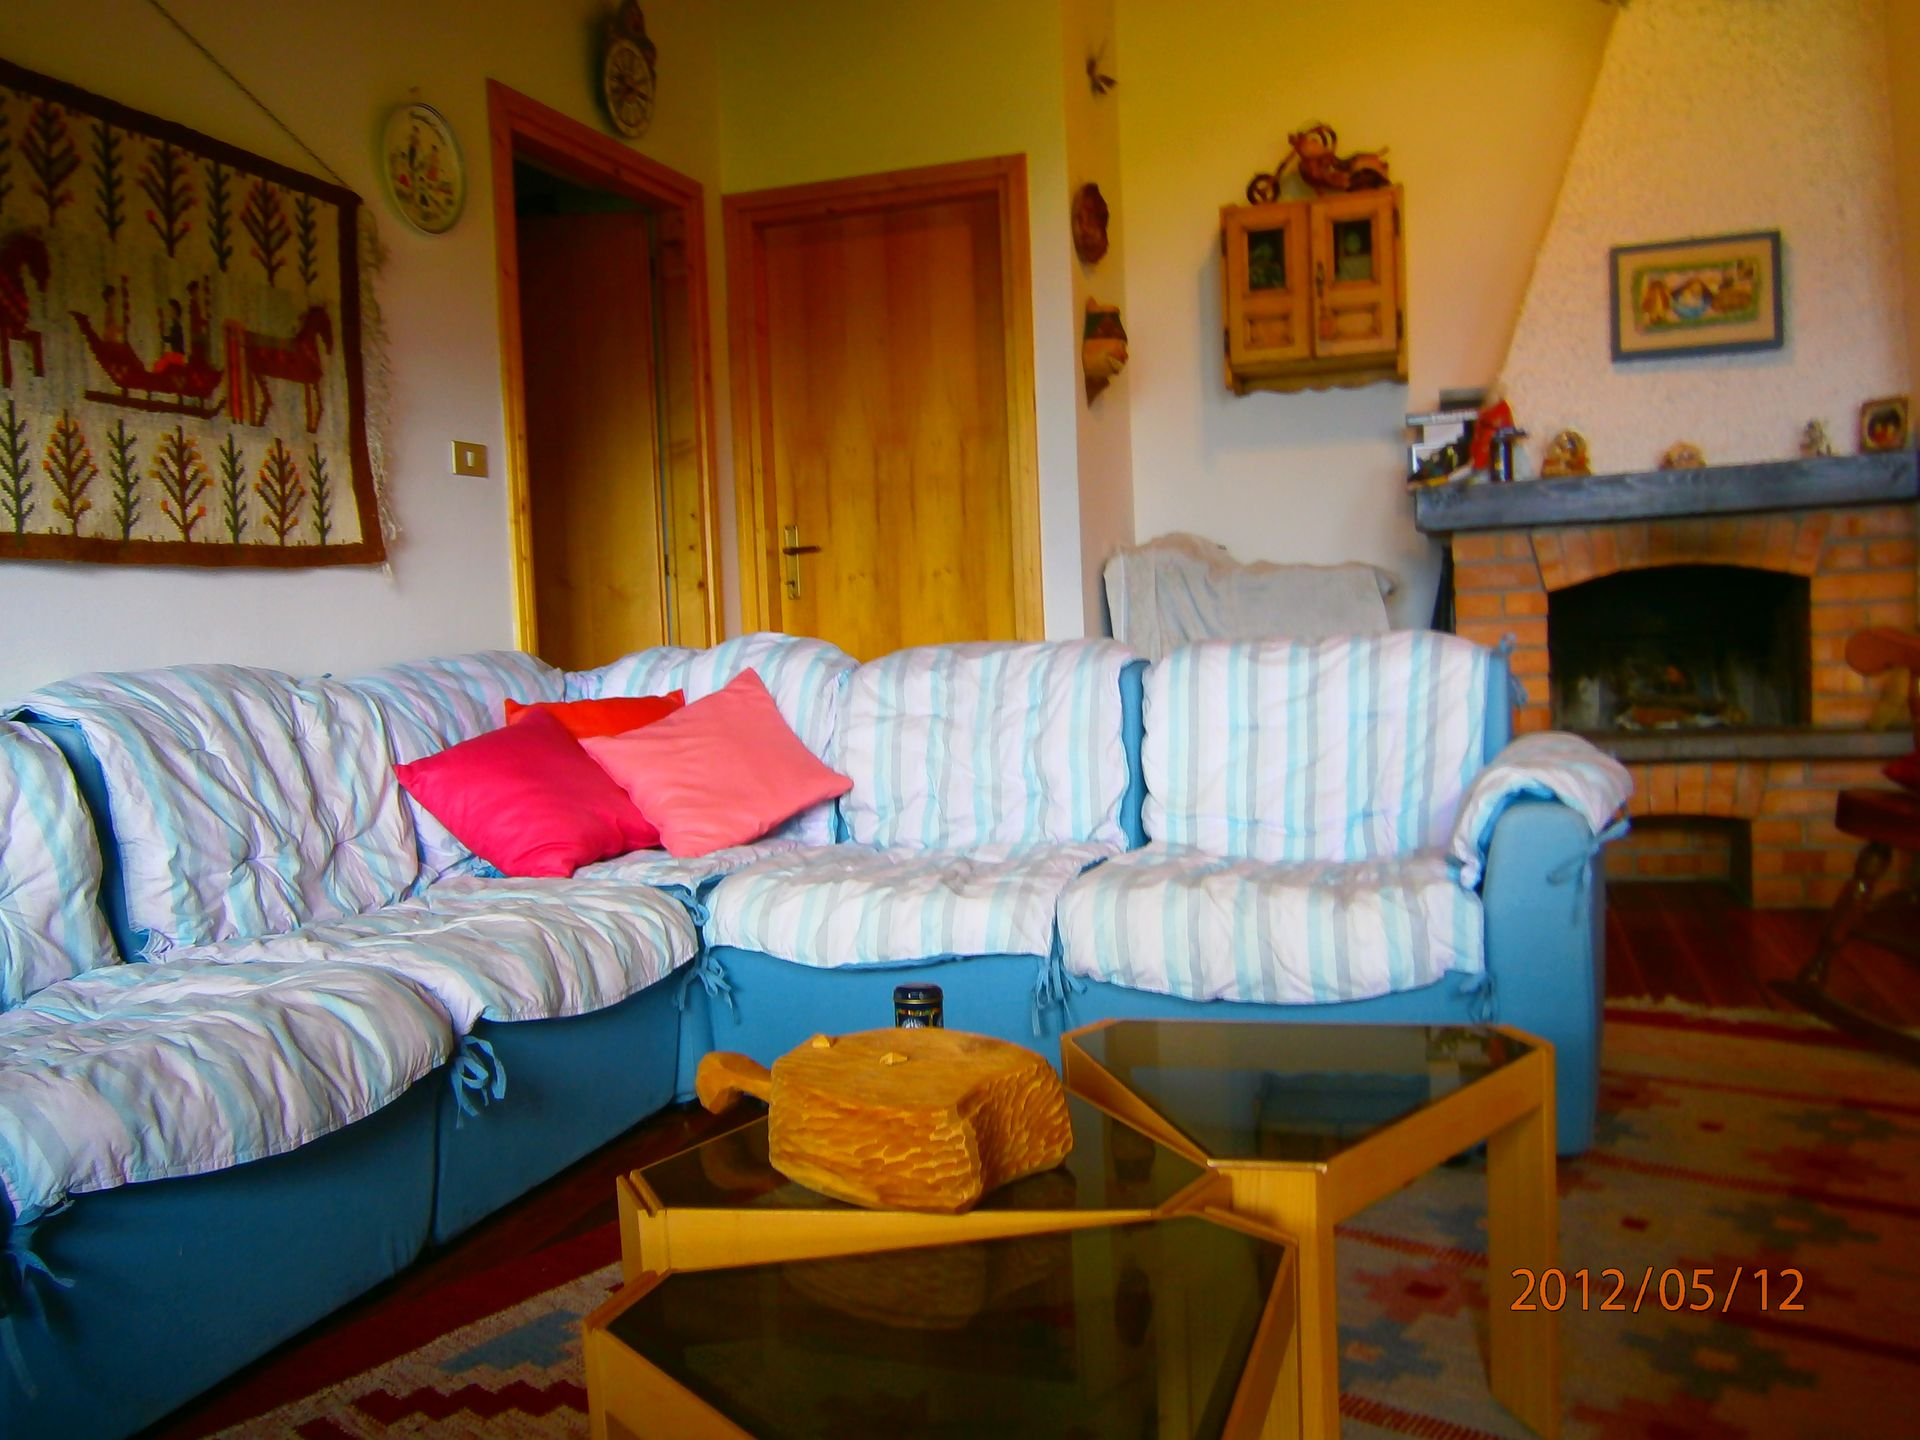 affitto appartamento montagna carano 7998 (20120926190946-2012-53608-NDP.JPG)